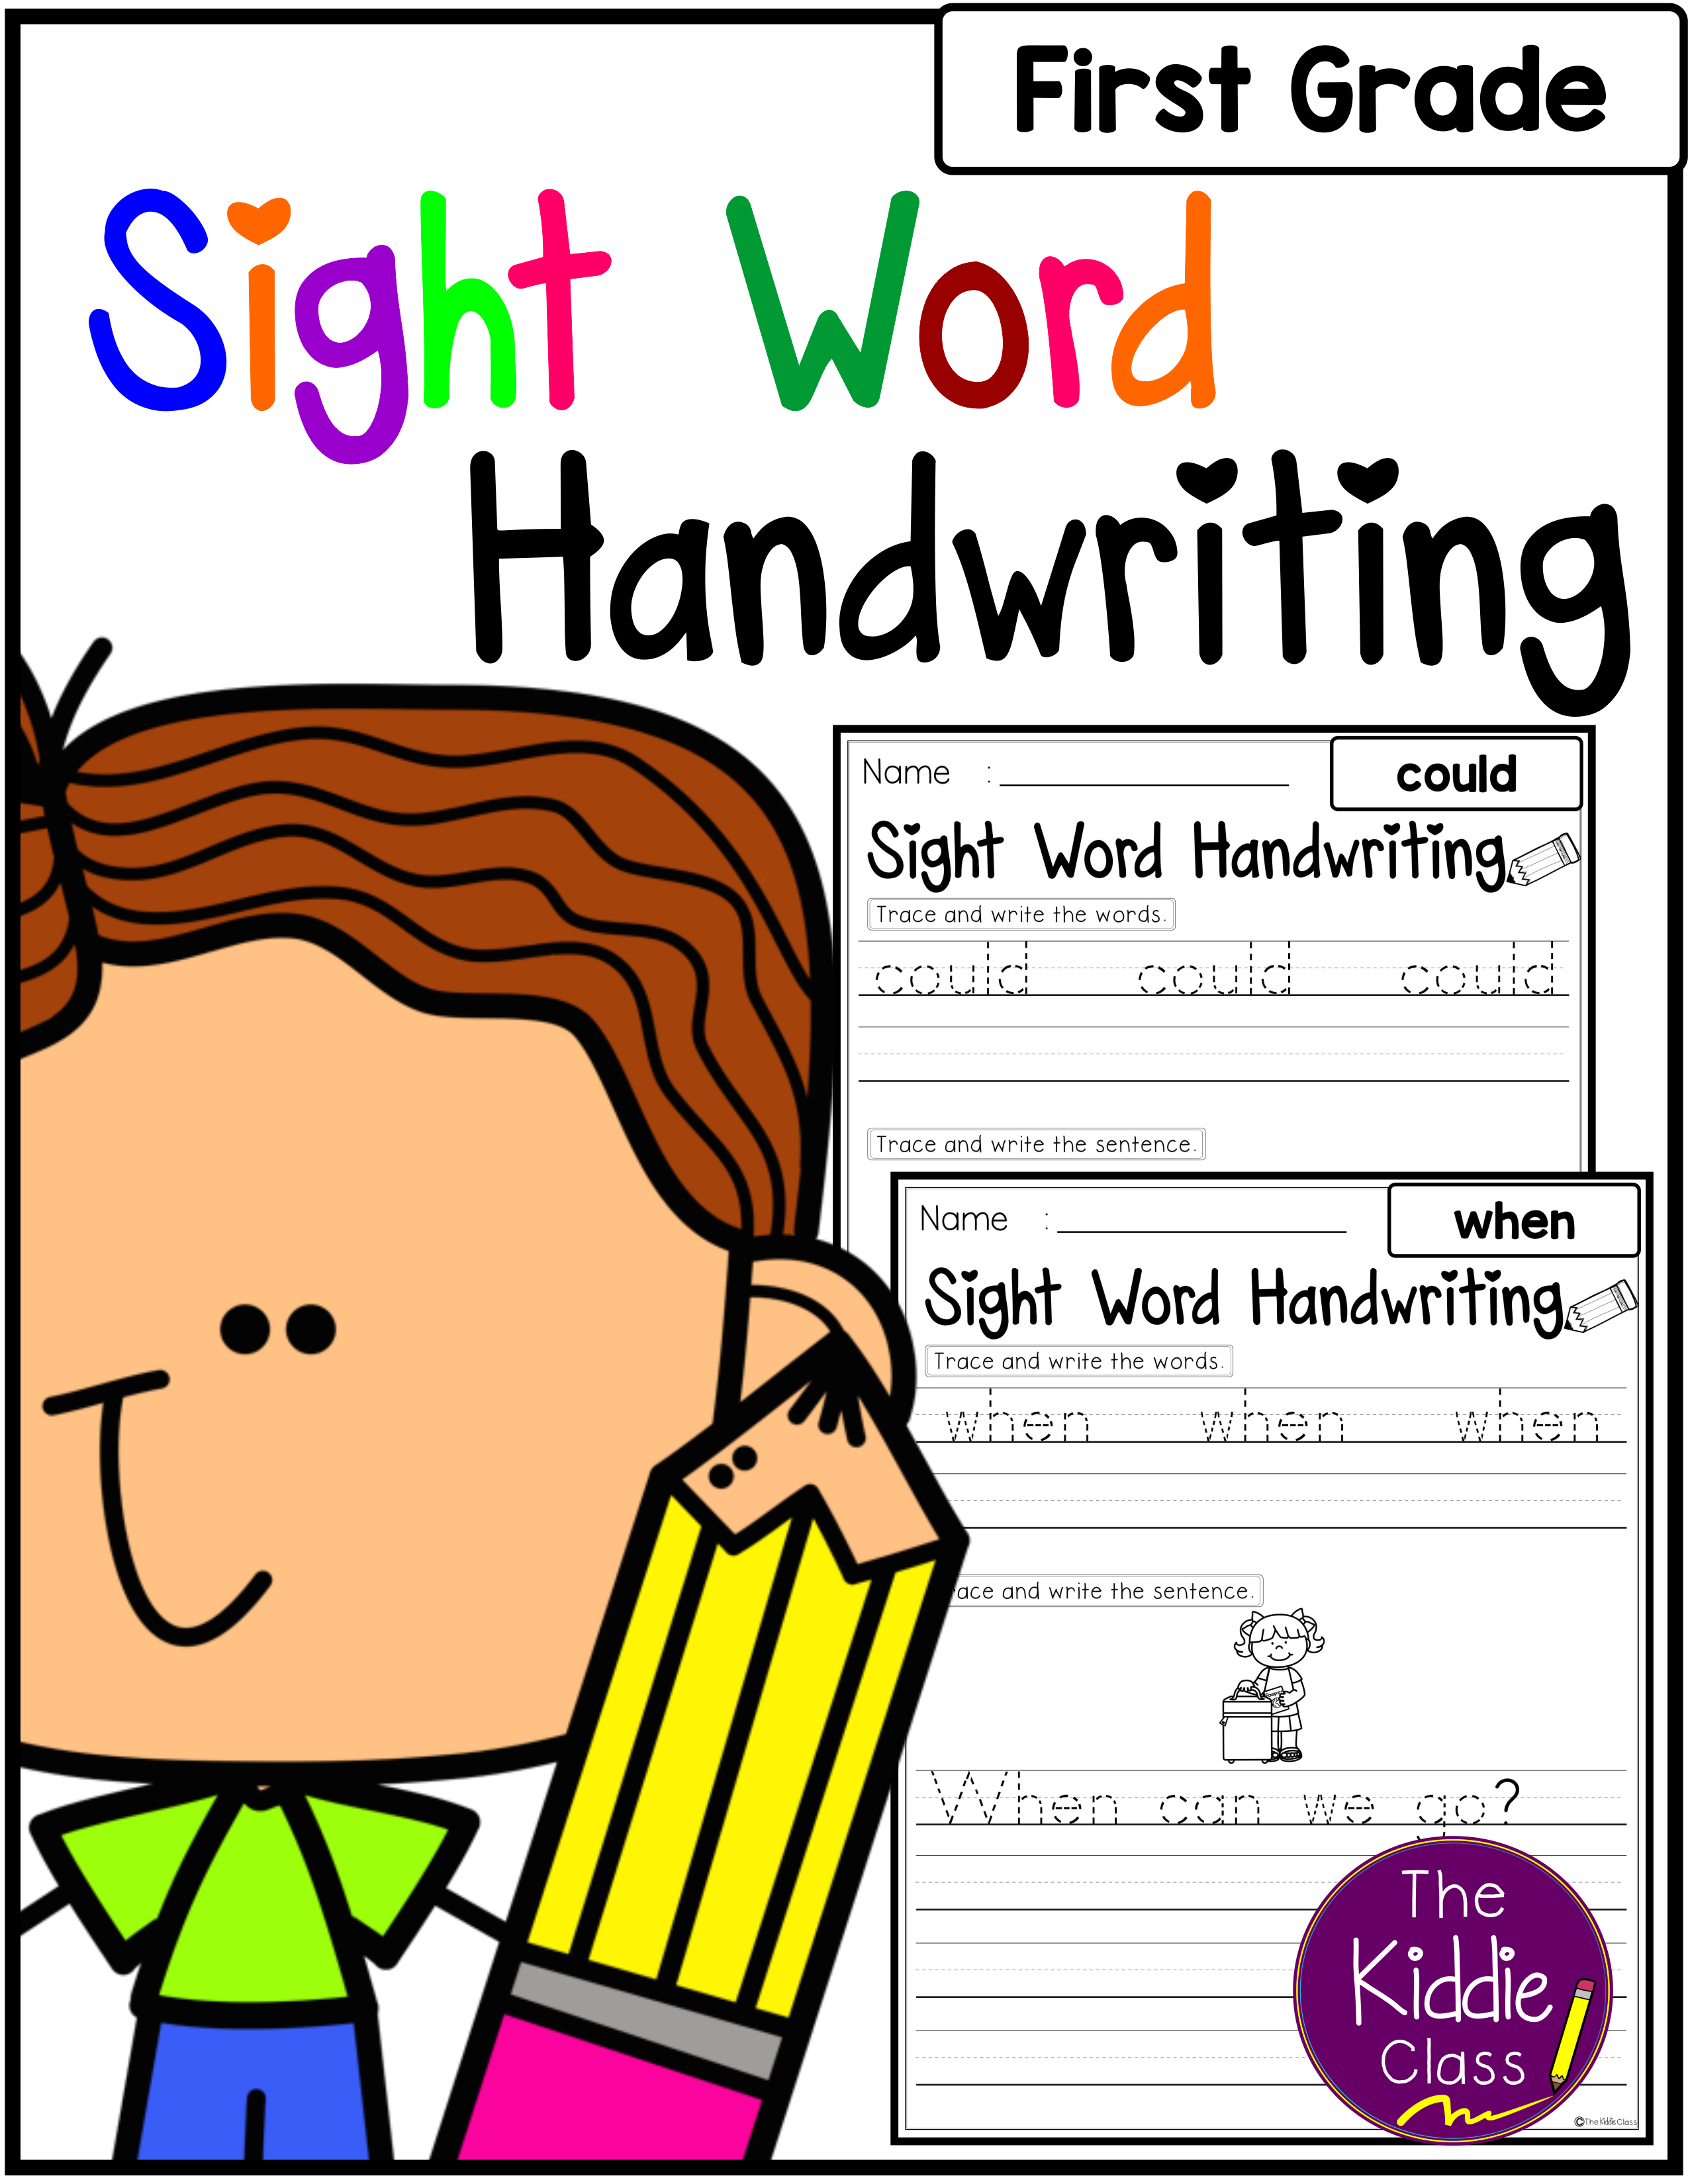 Sight Words Handwriting First Grade